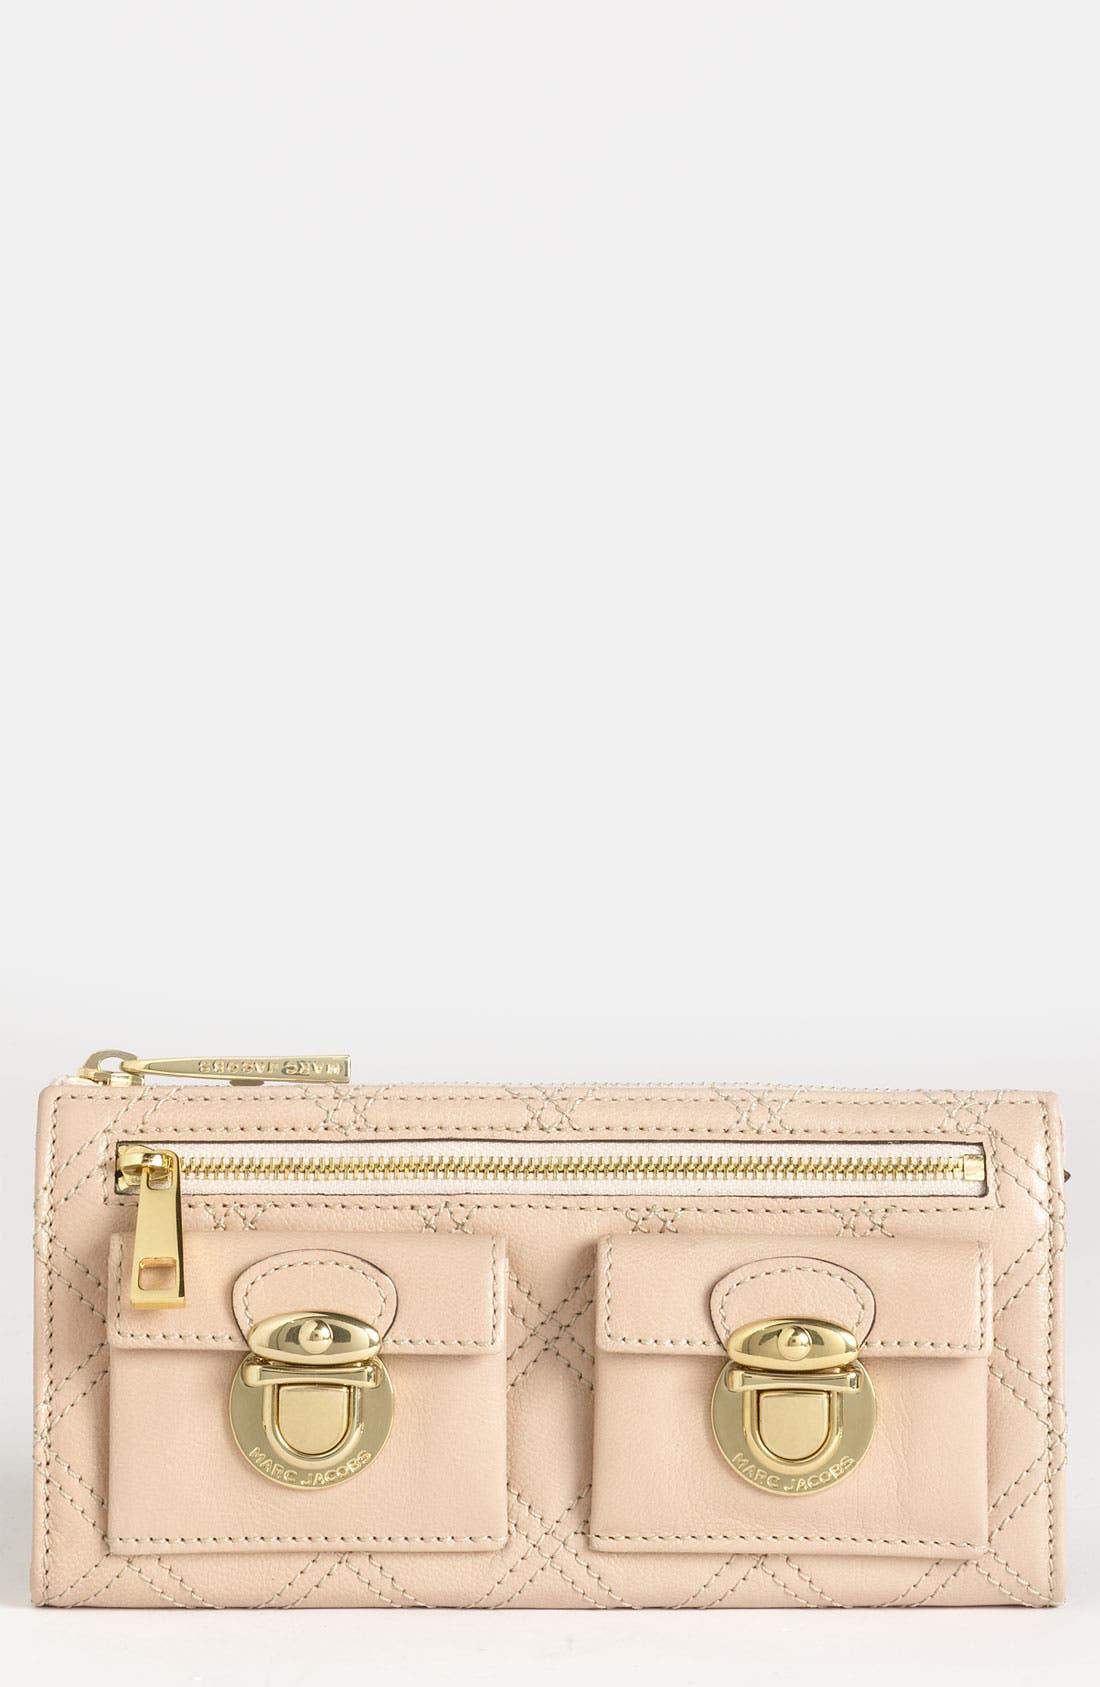 Main Image - MARC JACOBS 'Zip Deluxe' Leather Wallet